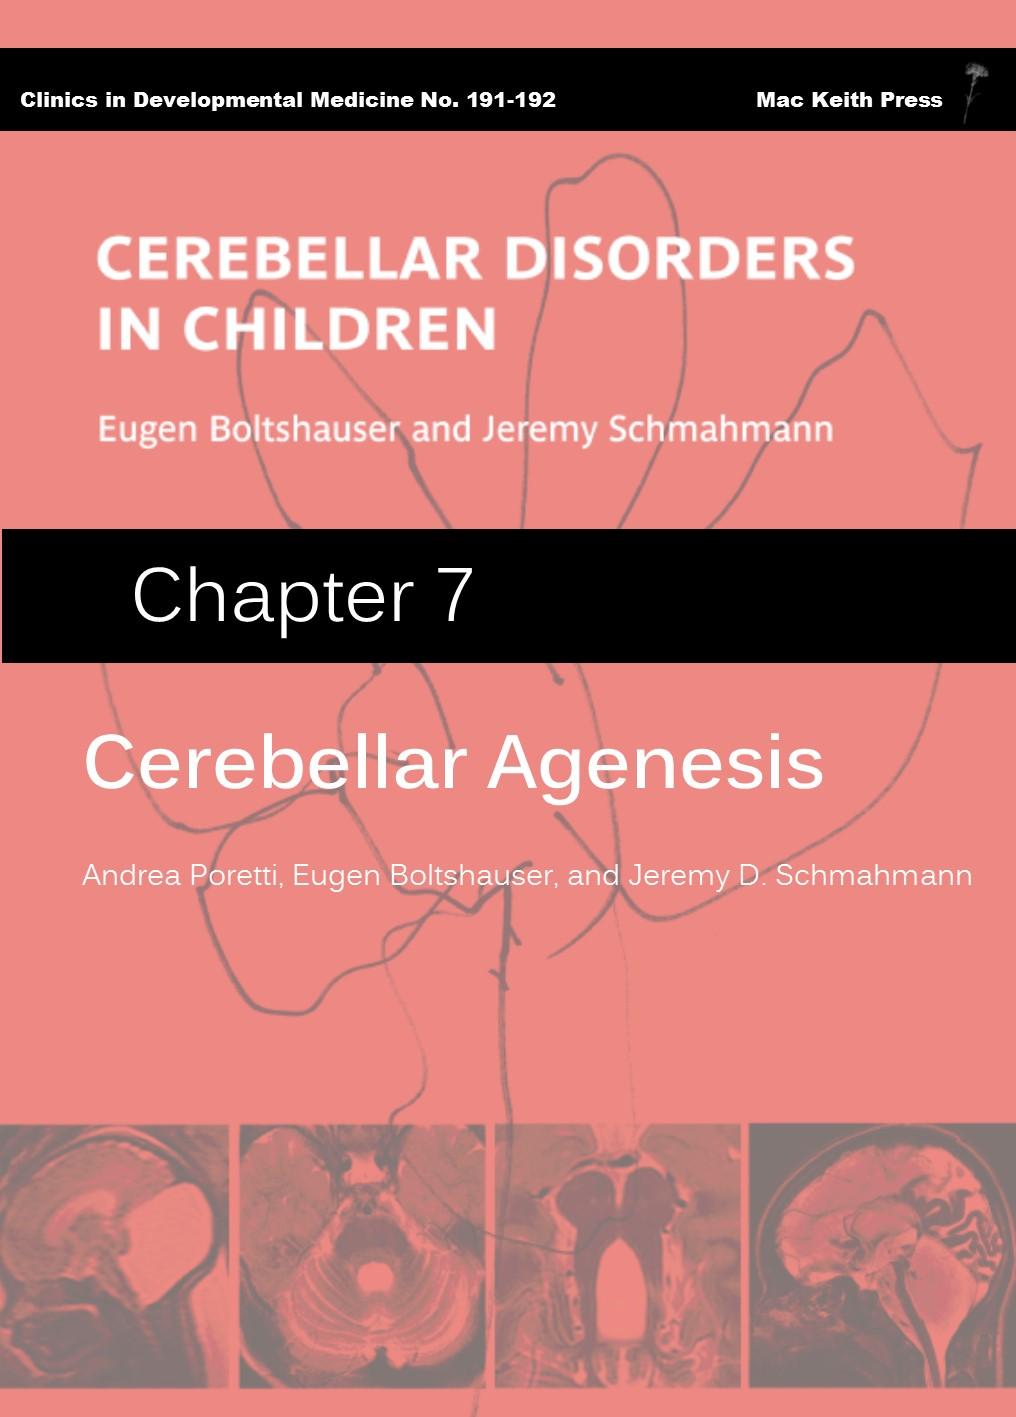 Cerebellar Agenesis - Cerebellar Disorders in Children (Chapter 7) COVER IMAGE